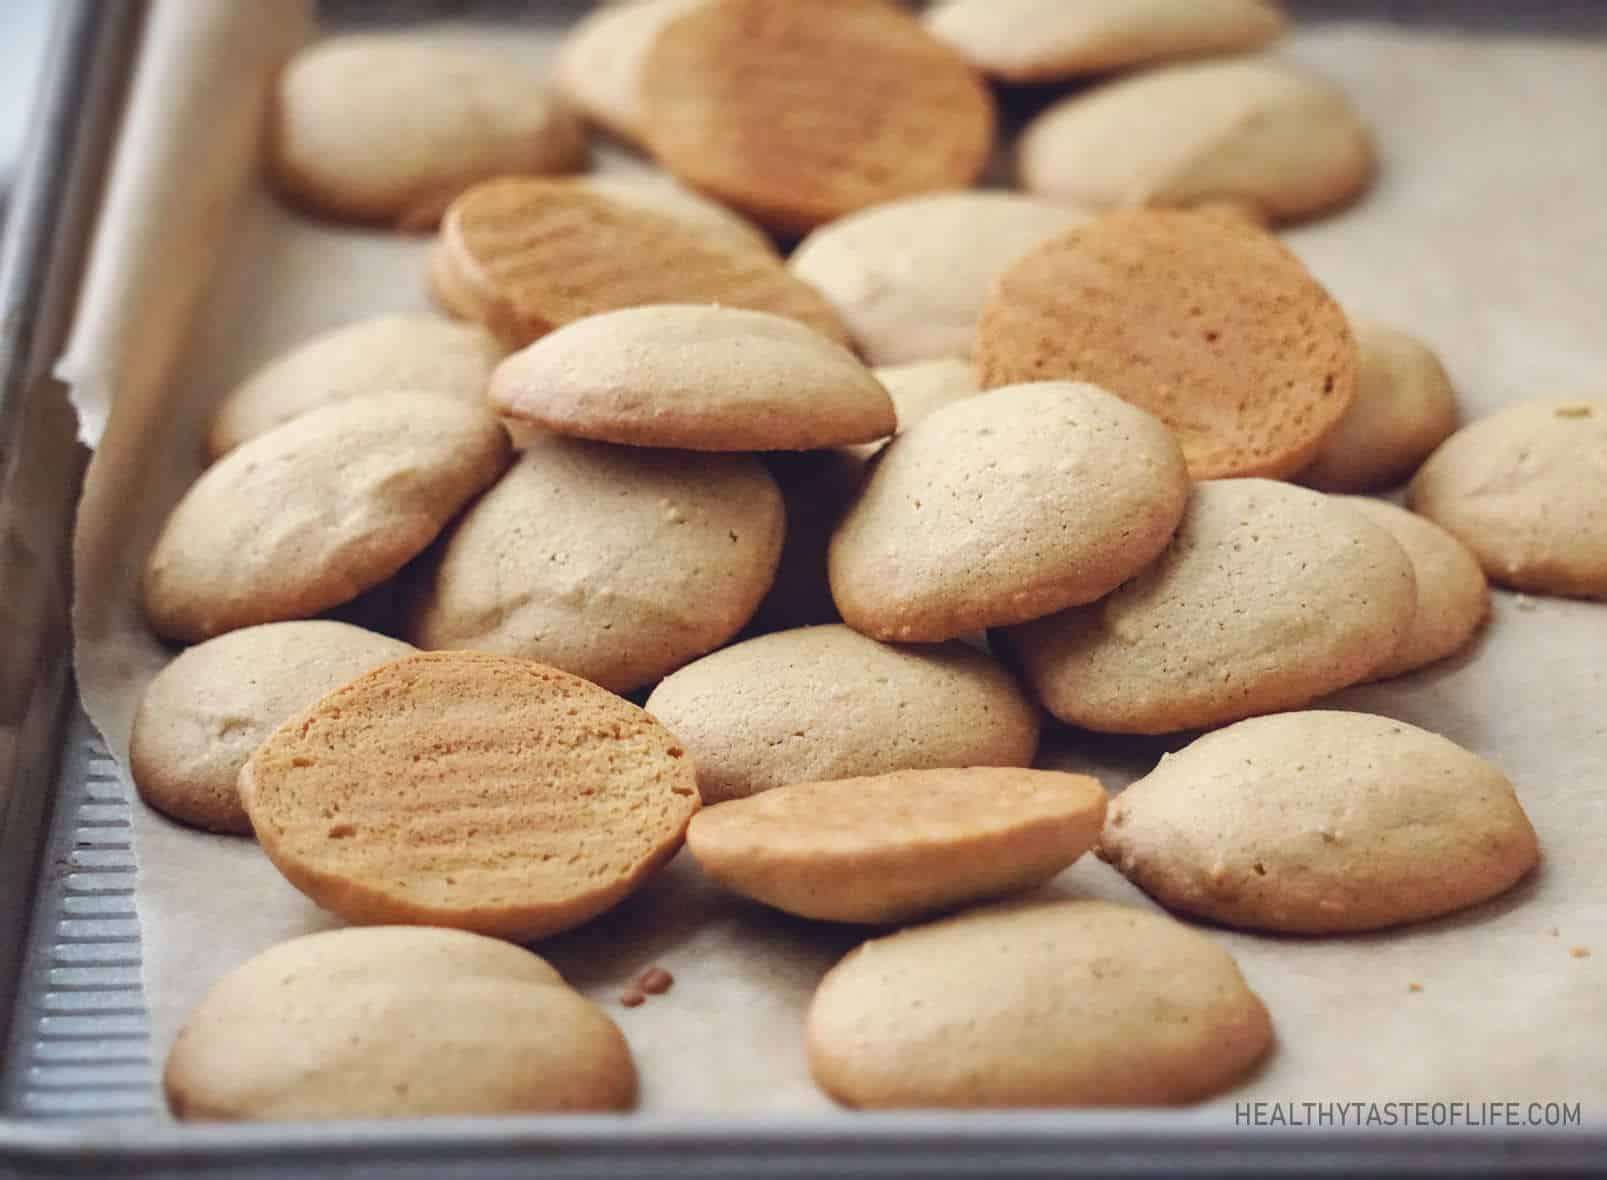 Homemade Gluten Free Vanilla Wafer Cookies (Dairy Free)